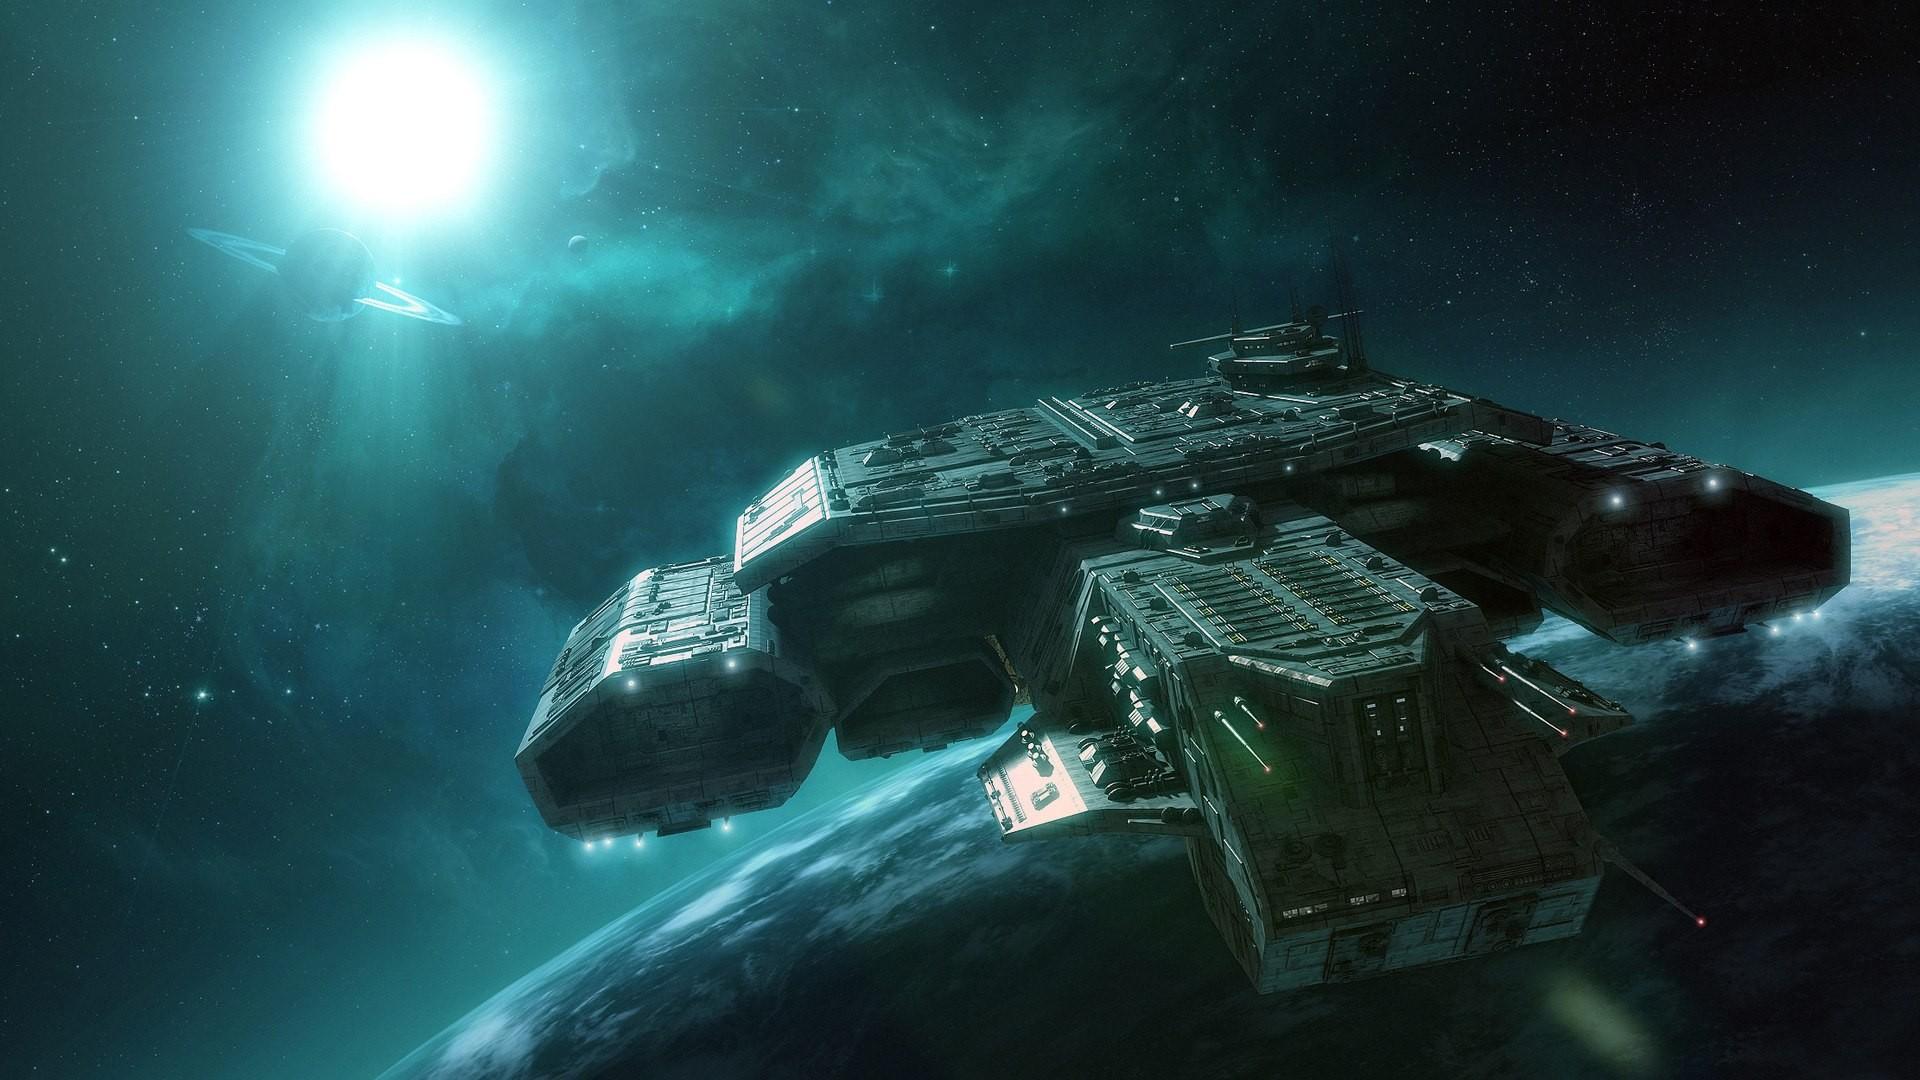 General 1920x1080 spaceship Stargate Daedalus-class space Apollo science fiction